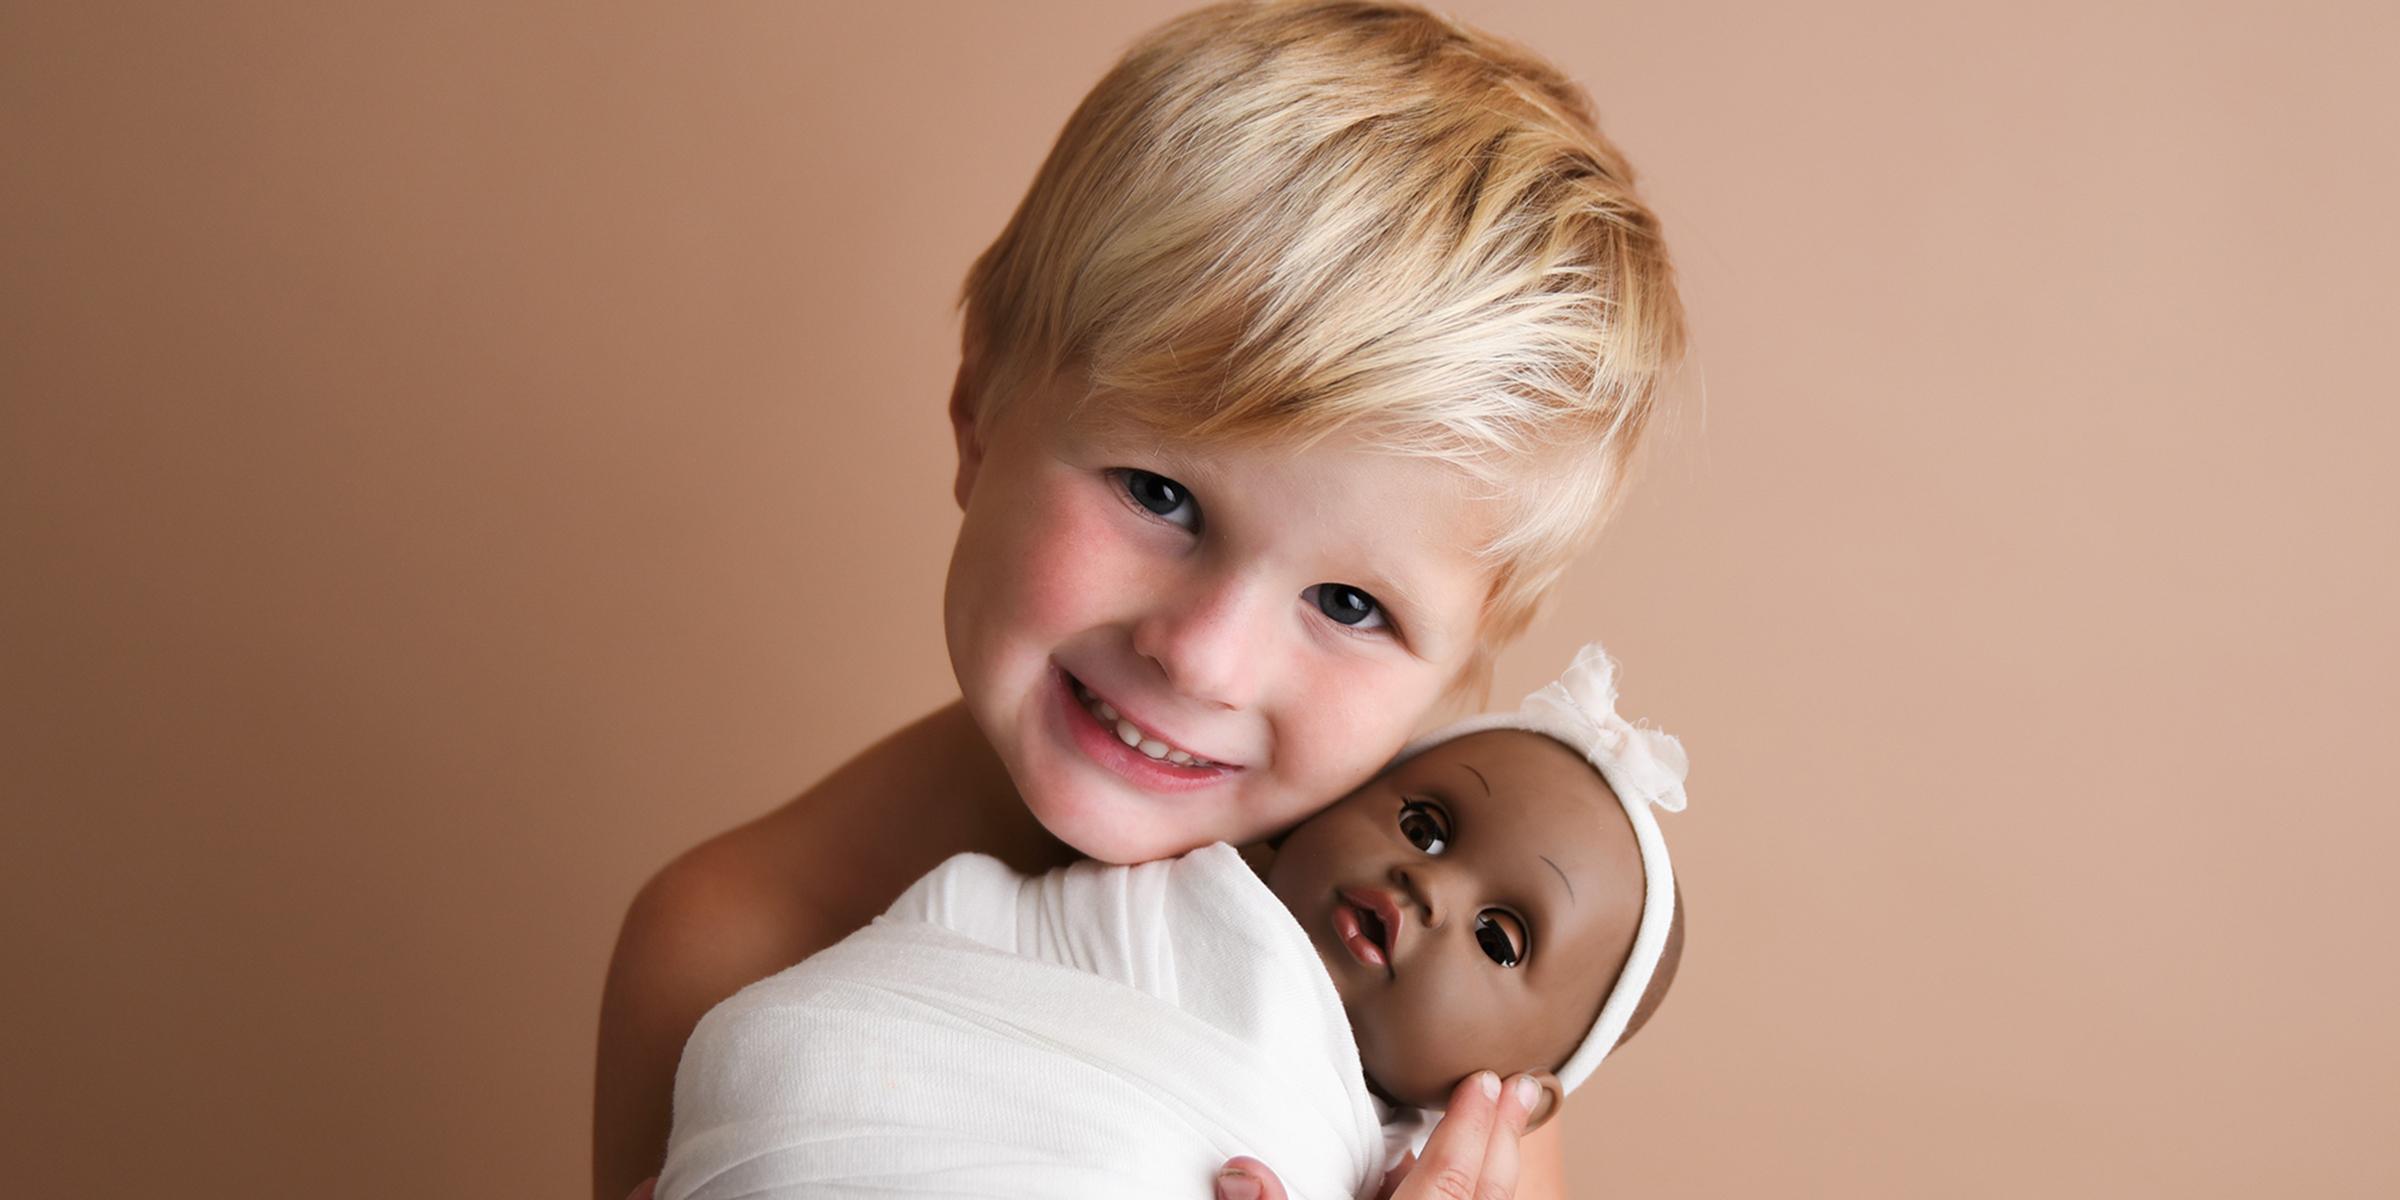 Baby doll com